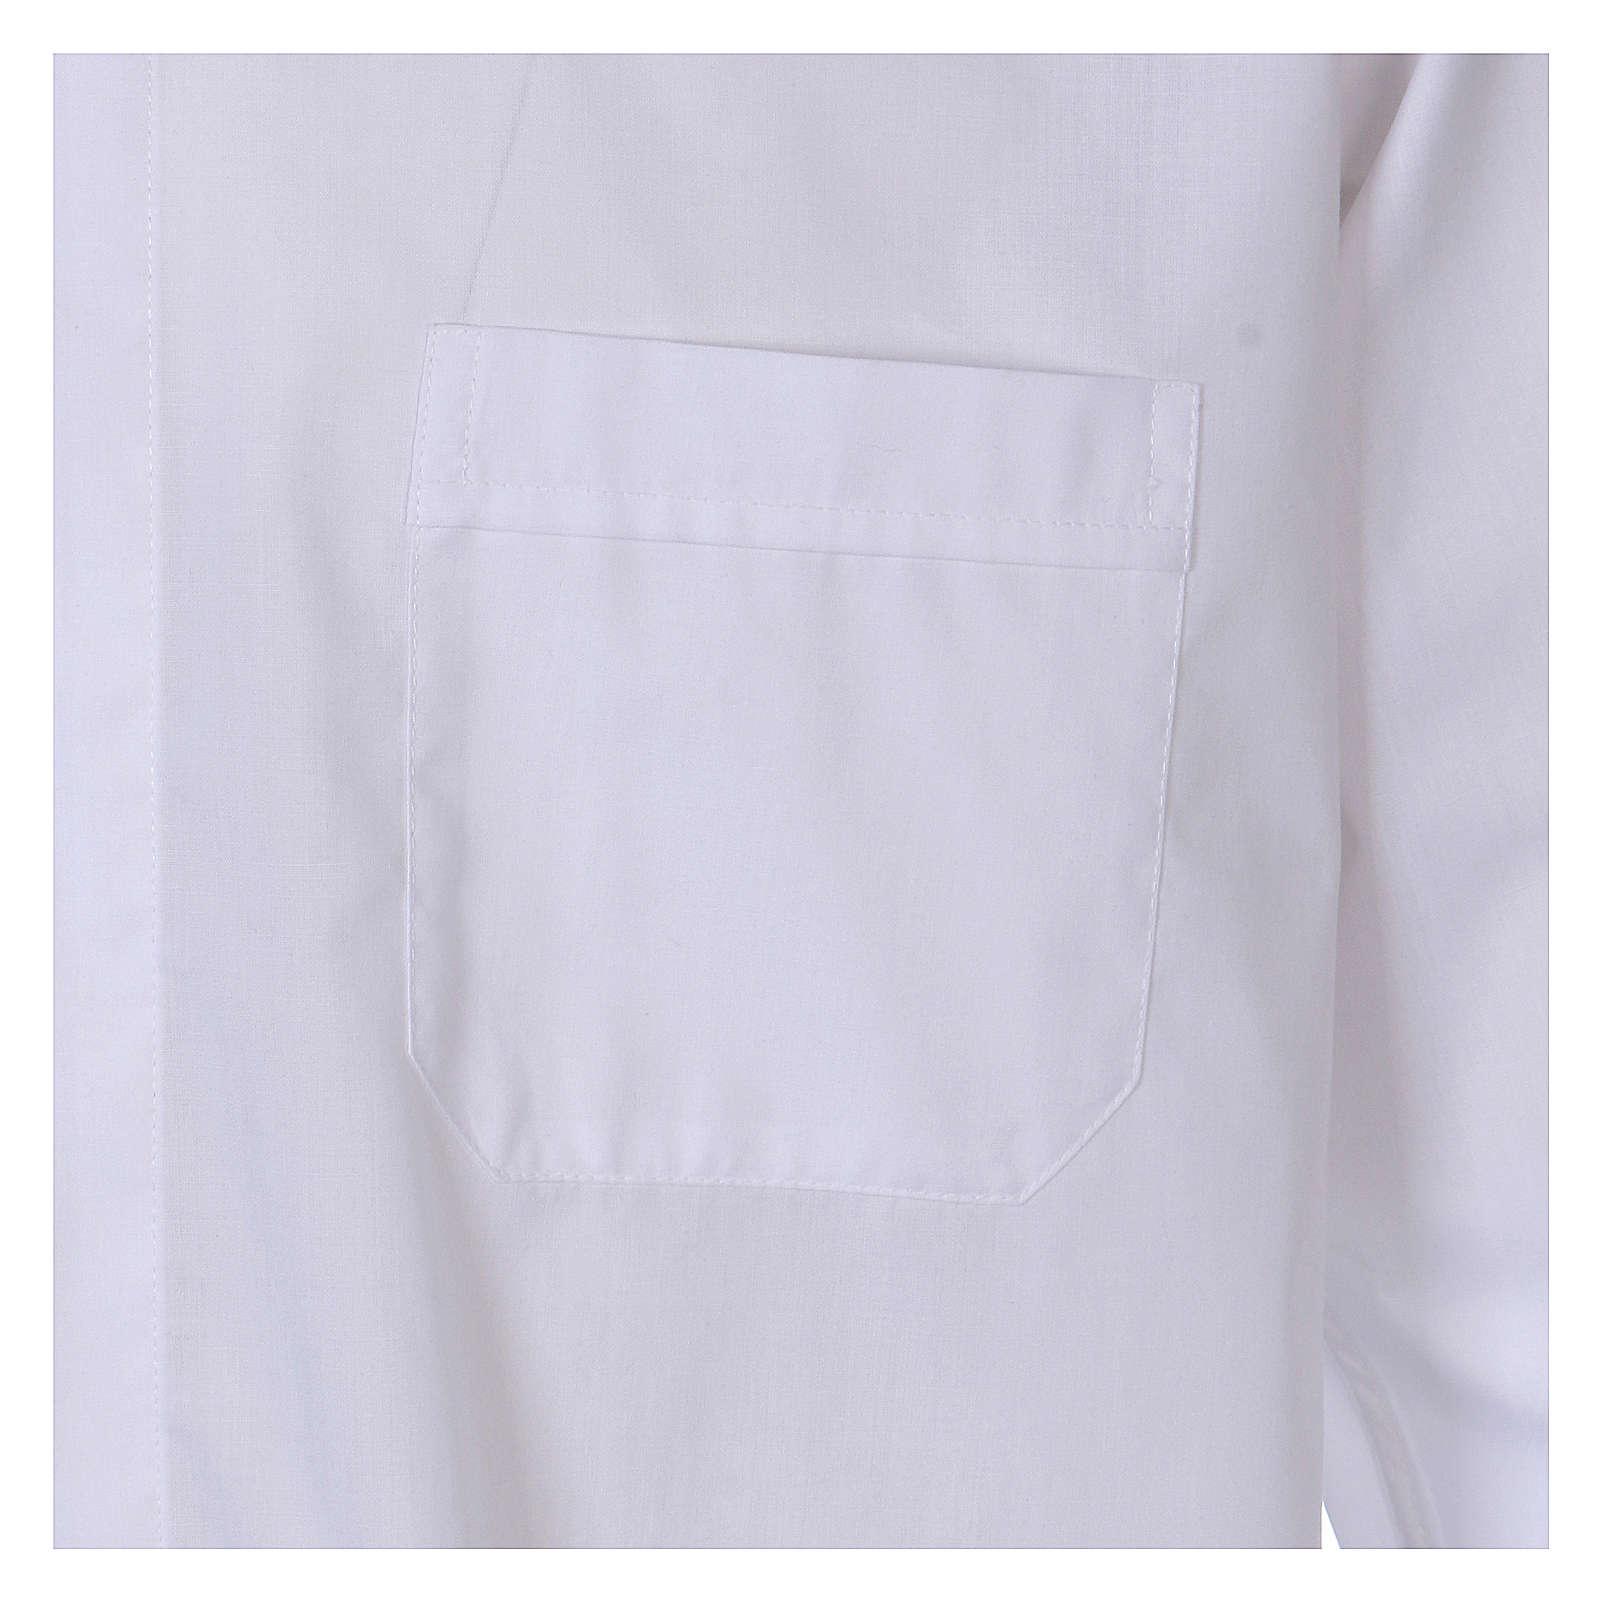 Camisa colarinho Clergy manga longa misto algodão branco In Primis 4